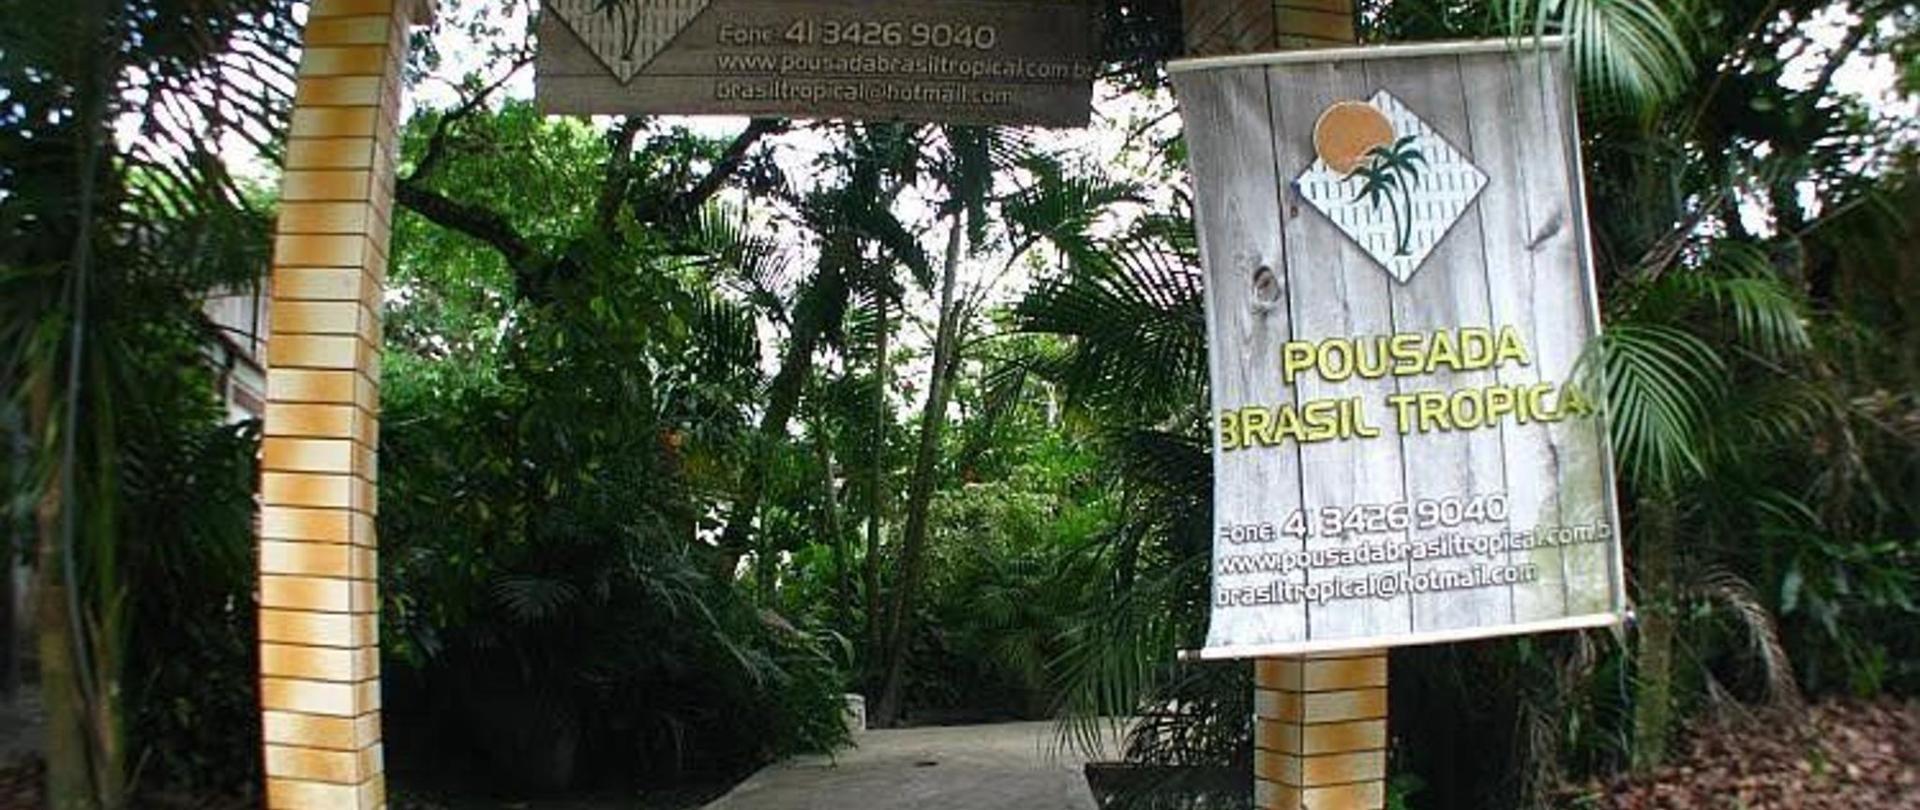 brasil-tropical-1.jpg